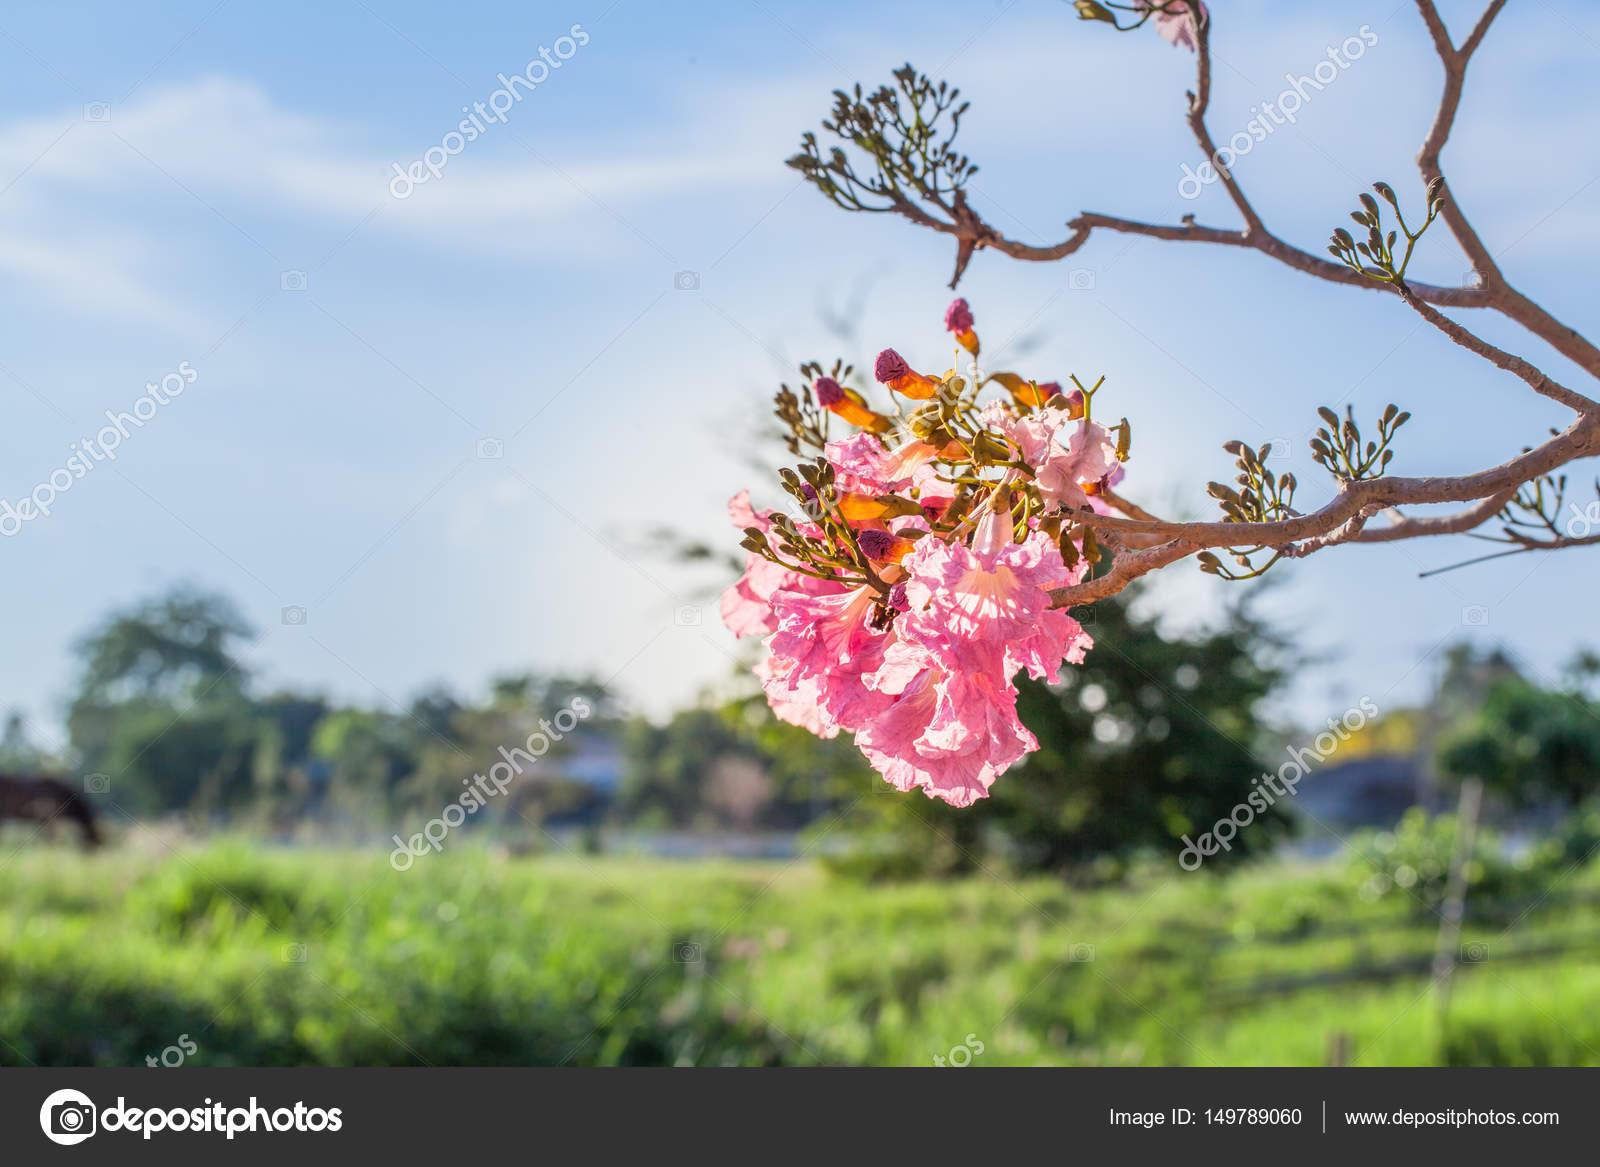 Pink trumpet flower tree stock photo thaisign 149789060 pink trumpet flower tree stock photo mightylinksfo